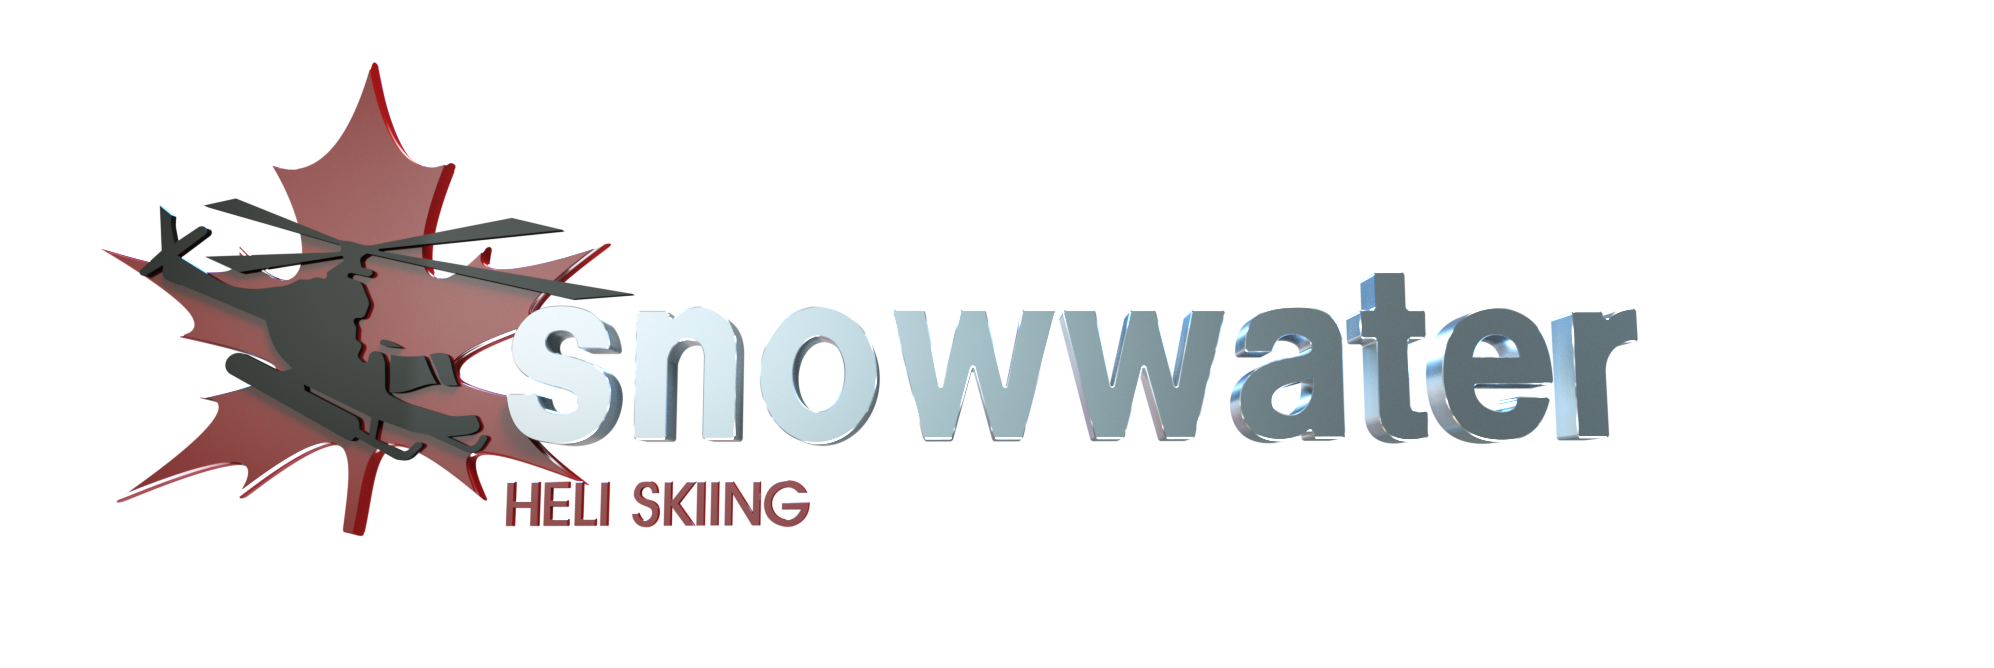 snowwater3d.png